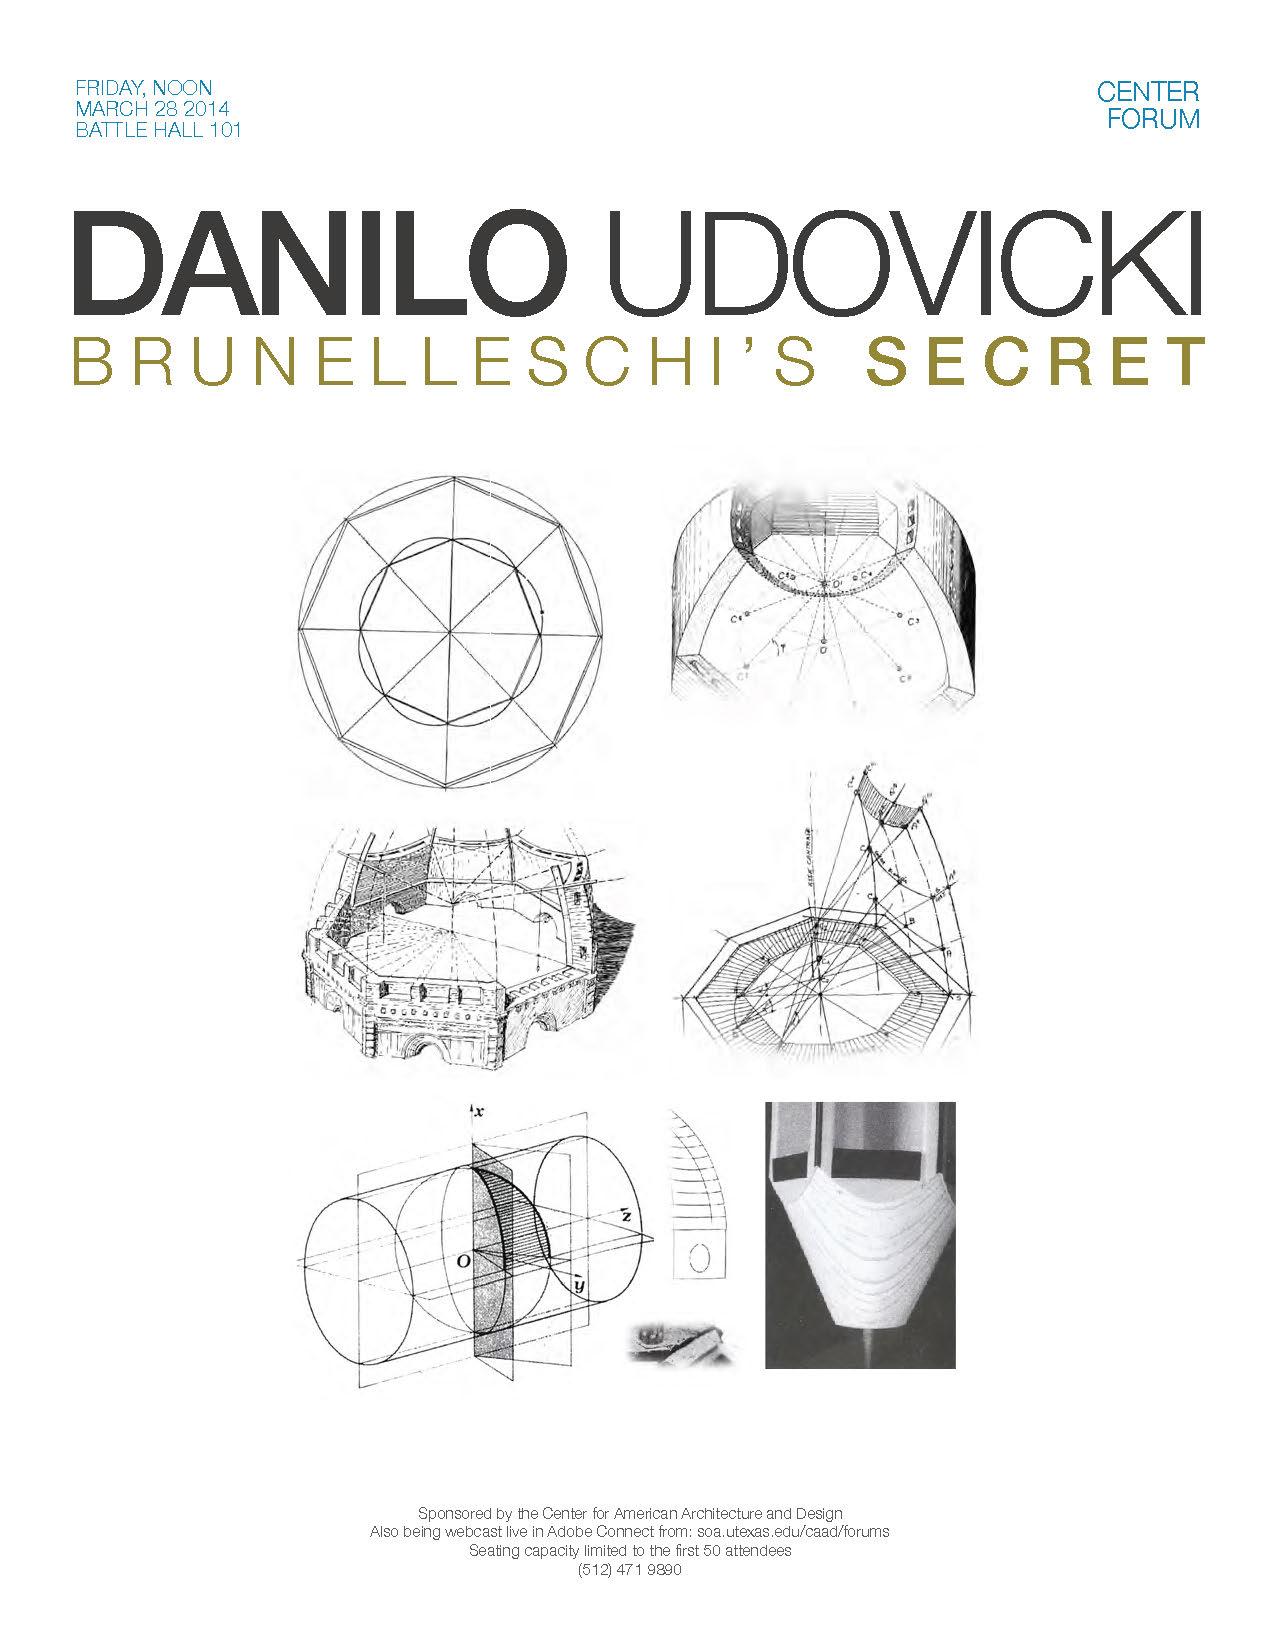 Danilo Udovicki - Brunelleschi's Secret